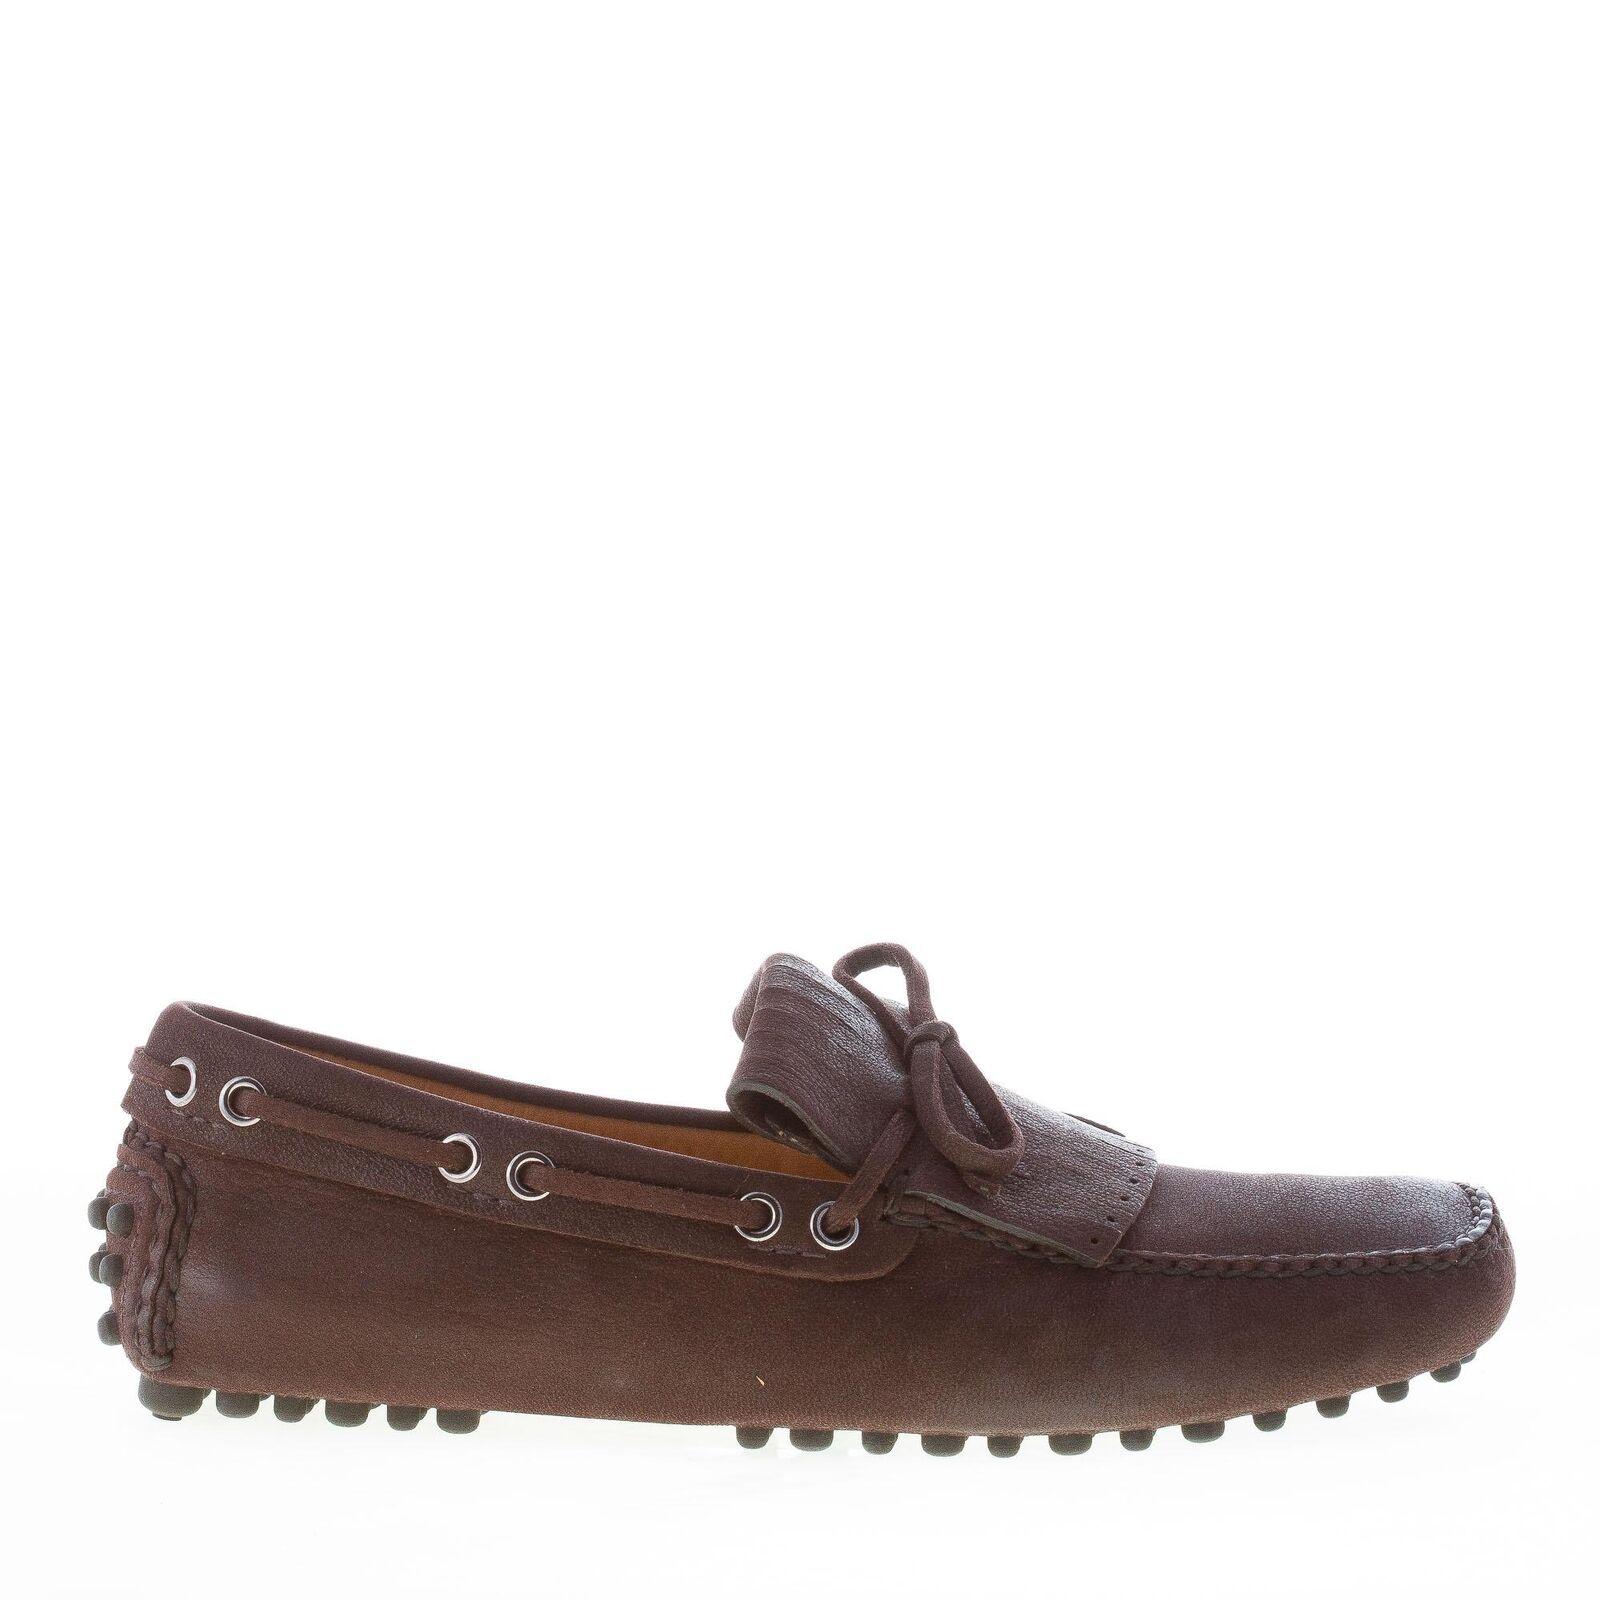 Scarpe casual da uomo  CAR SHOE scarpe uomo shoes Mocassino gommini pelle capra marrone ebano frangia